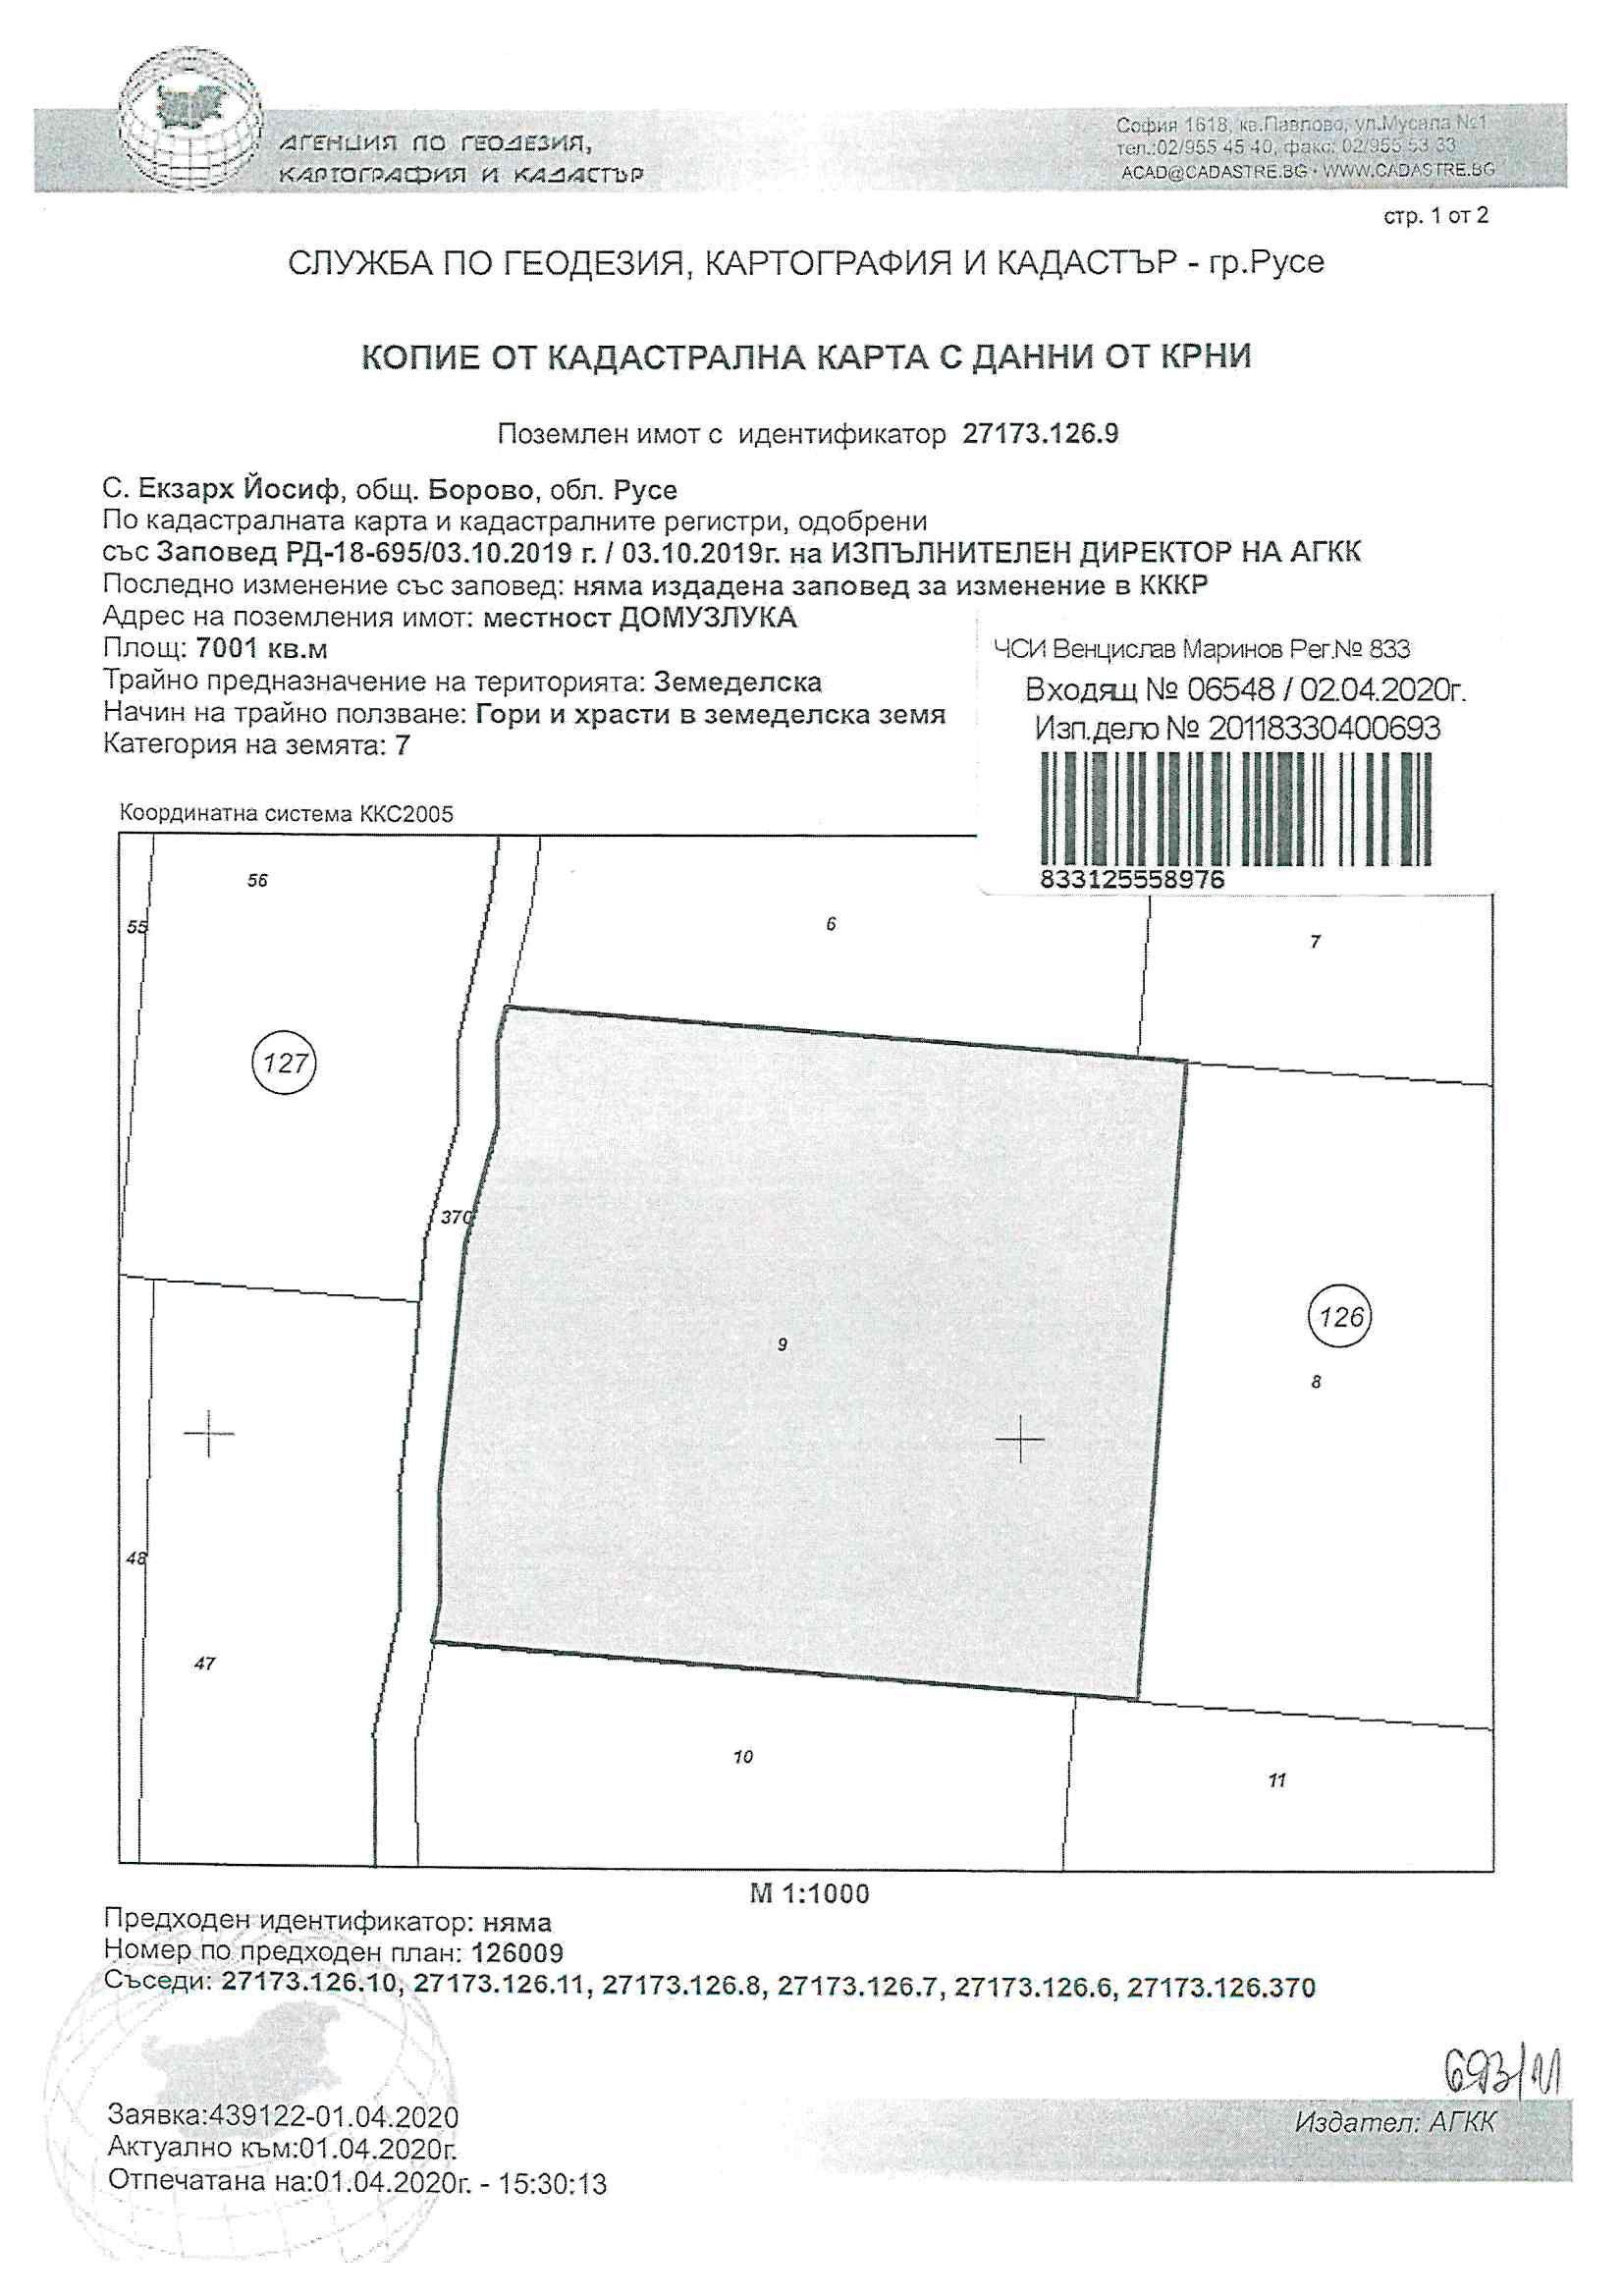 693/2011 -  ЗЕМЕДЕЛСКA ЗЕМЯ, В С.ЕКЗАРХ ЙОСИФ, МЕСТНОСТ ДОМУЗЛУКА